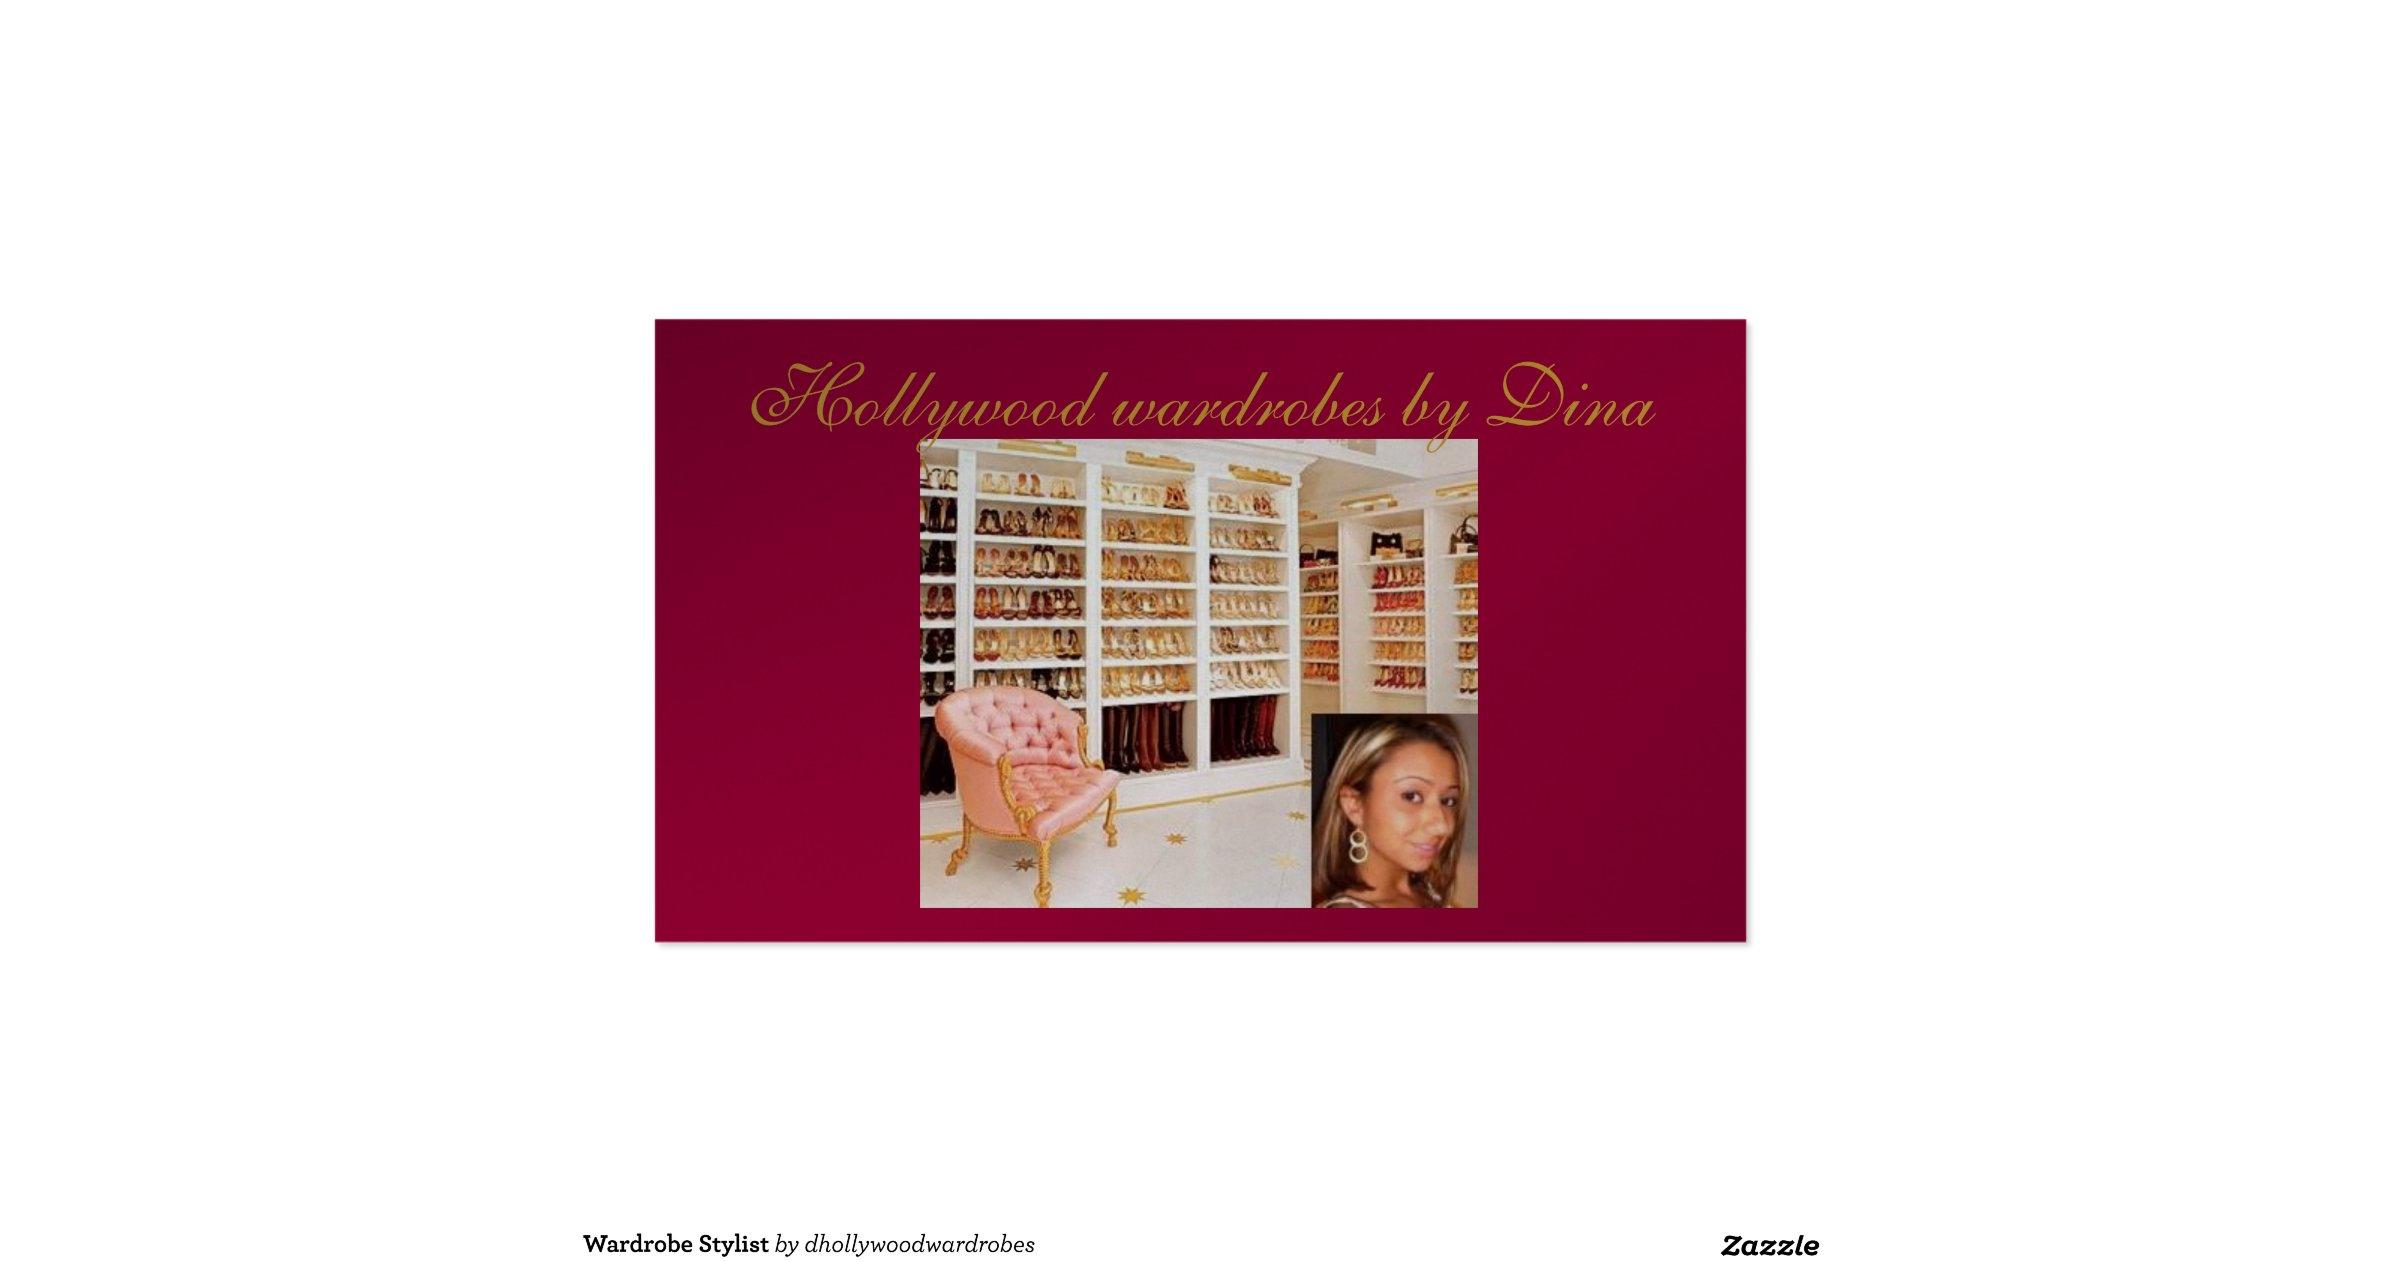 Photo Wardrobe Stylist Business Cards Images